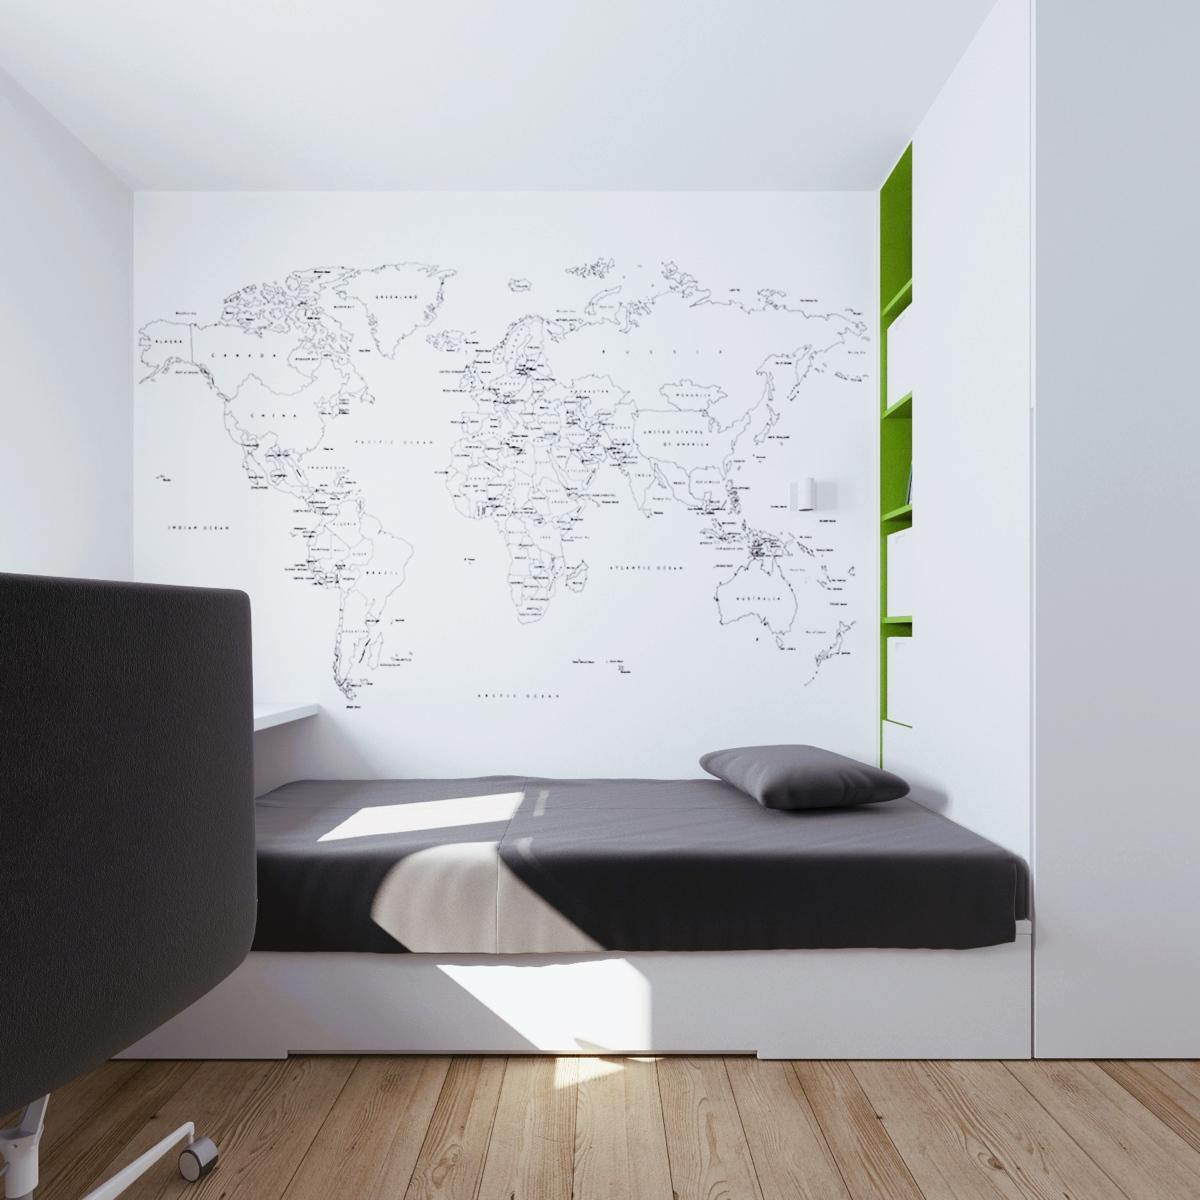 Cool bedroom design ideas